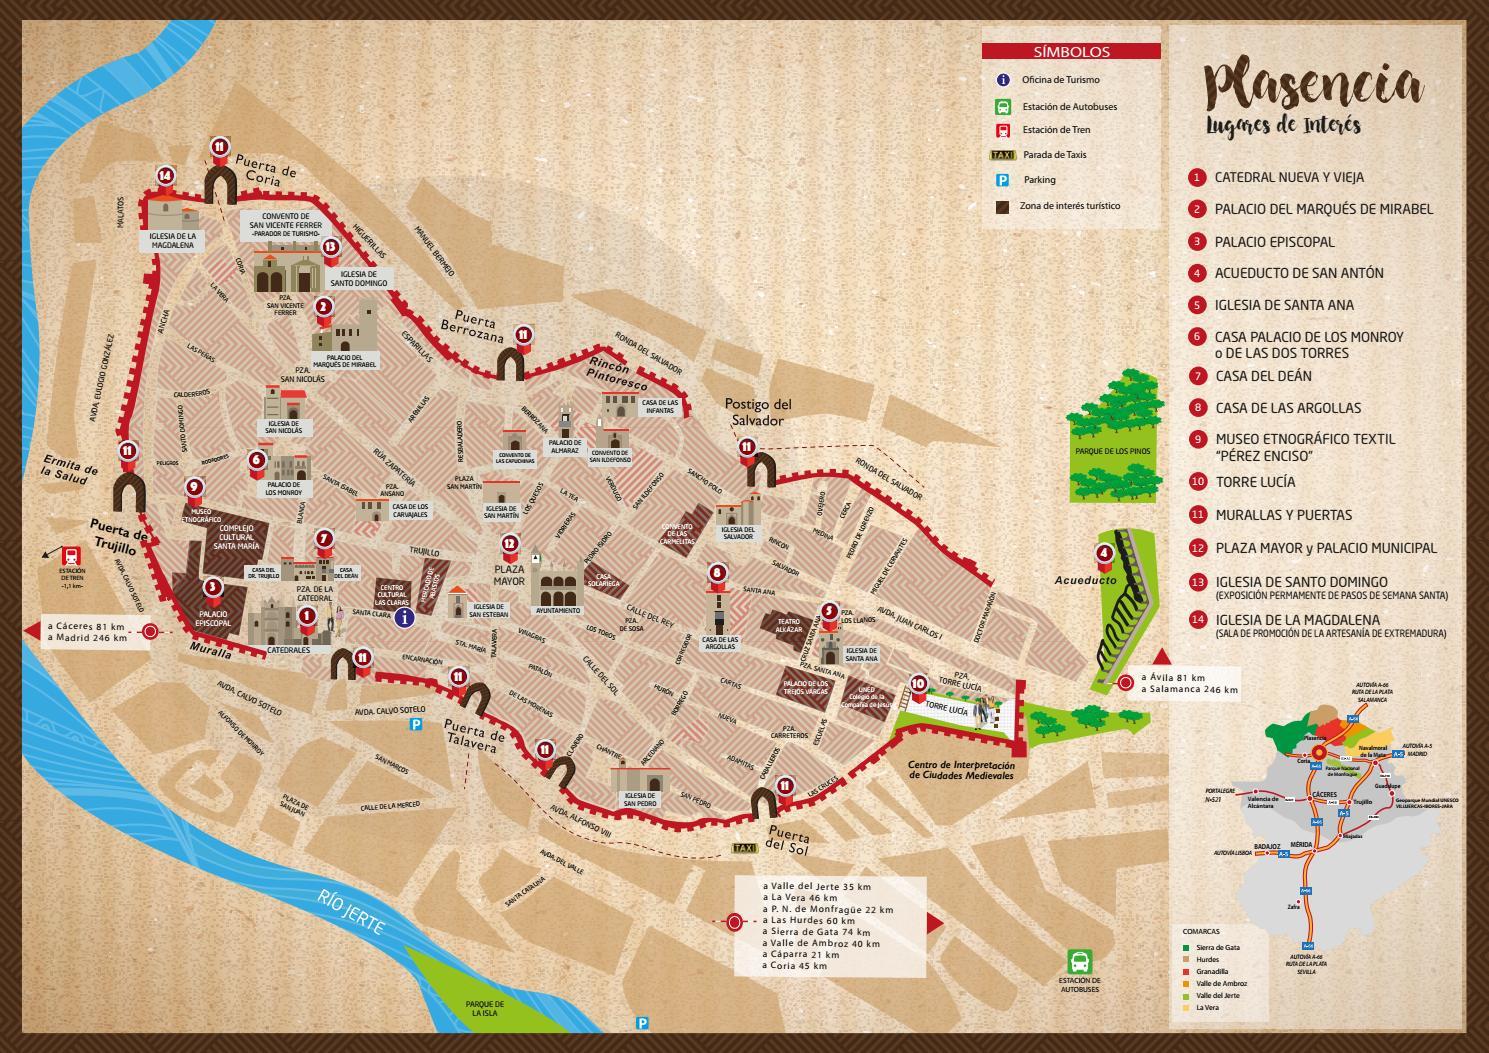 Mapa Turistico De Avila.Plano De Plasencia By Extremadura Turismo Issuu